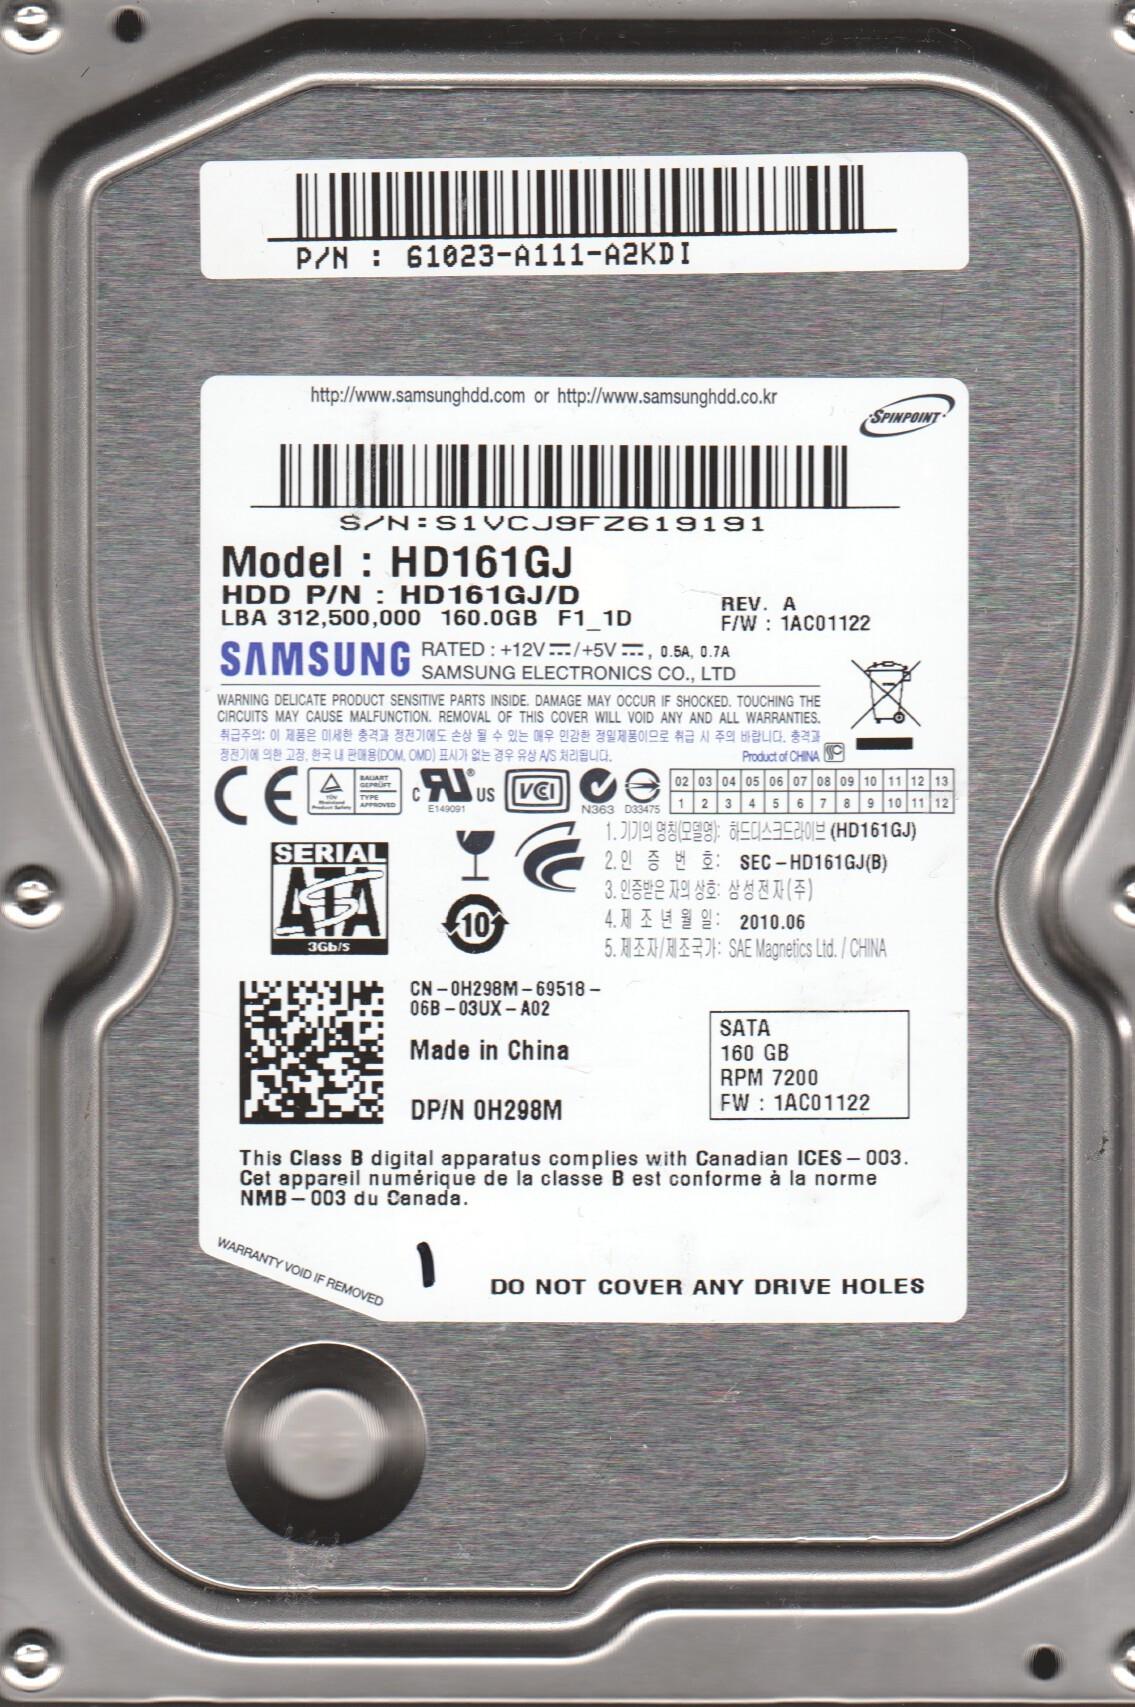 Samsung Hd161gj Internal 160 Gb 7200rpm Hard Disk Clickbd Hdd Sata Like New Large Image 0